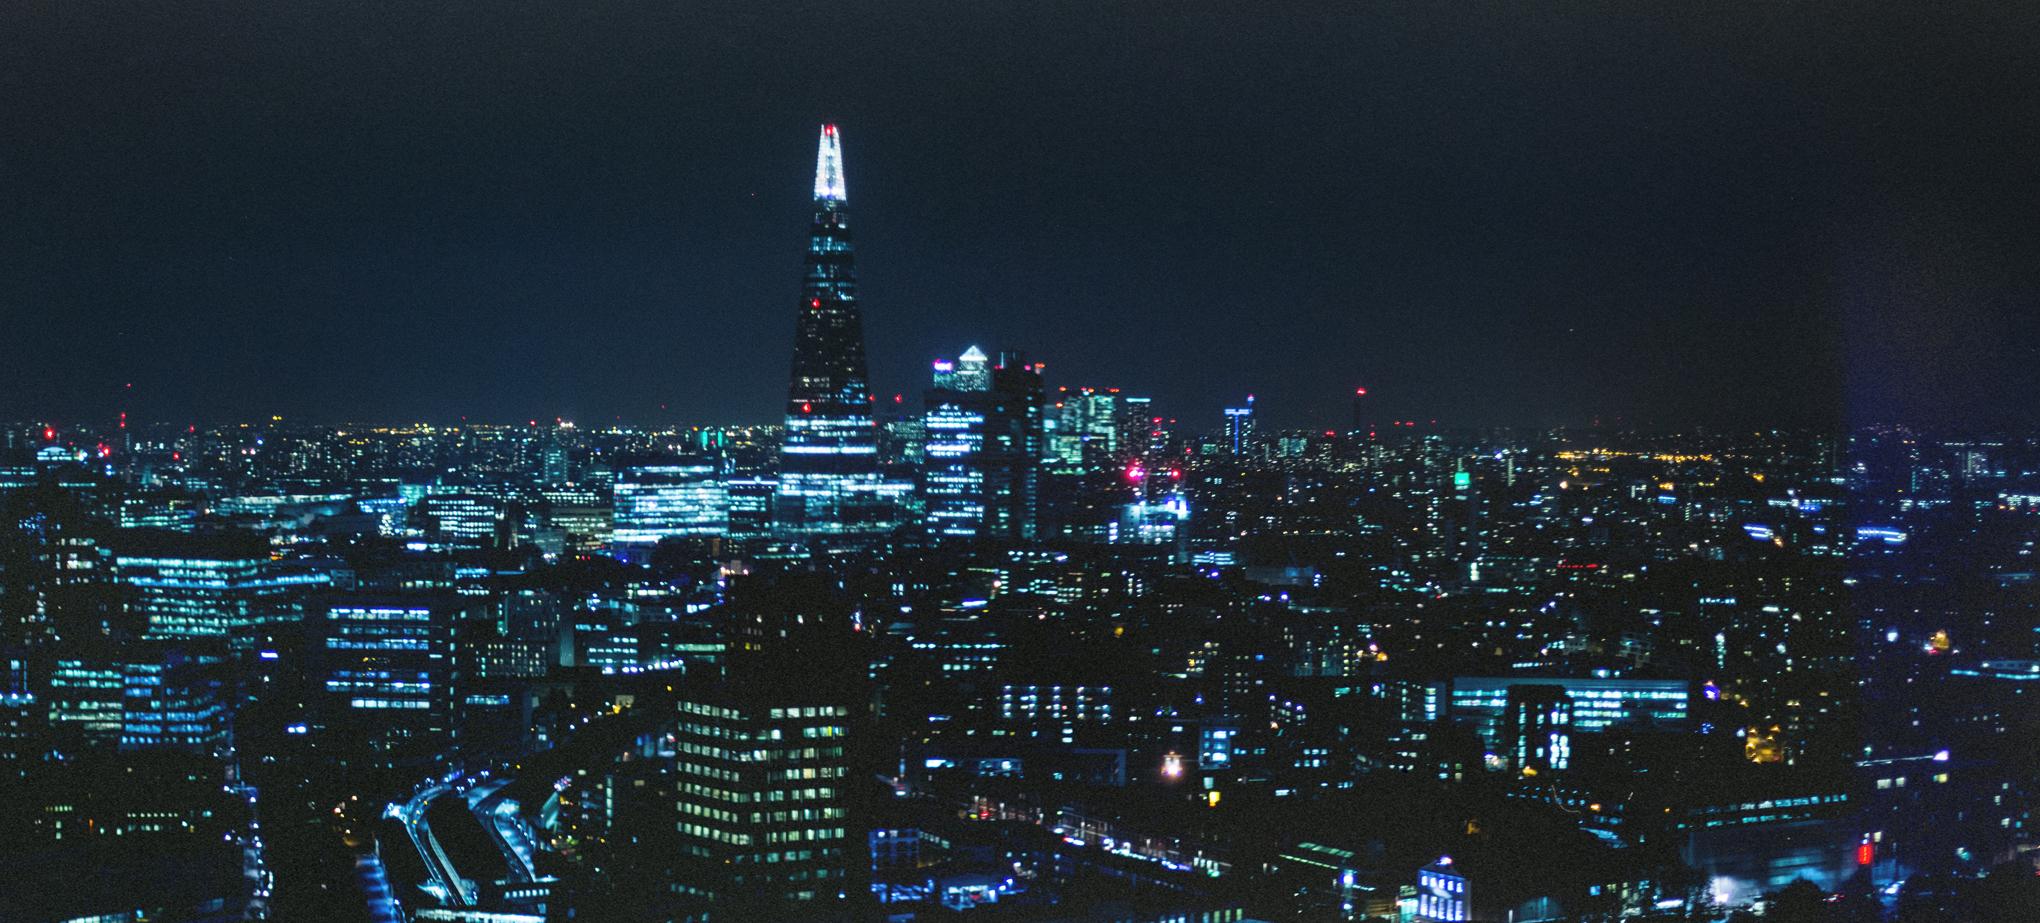 London, England, United Kingdom, November2014